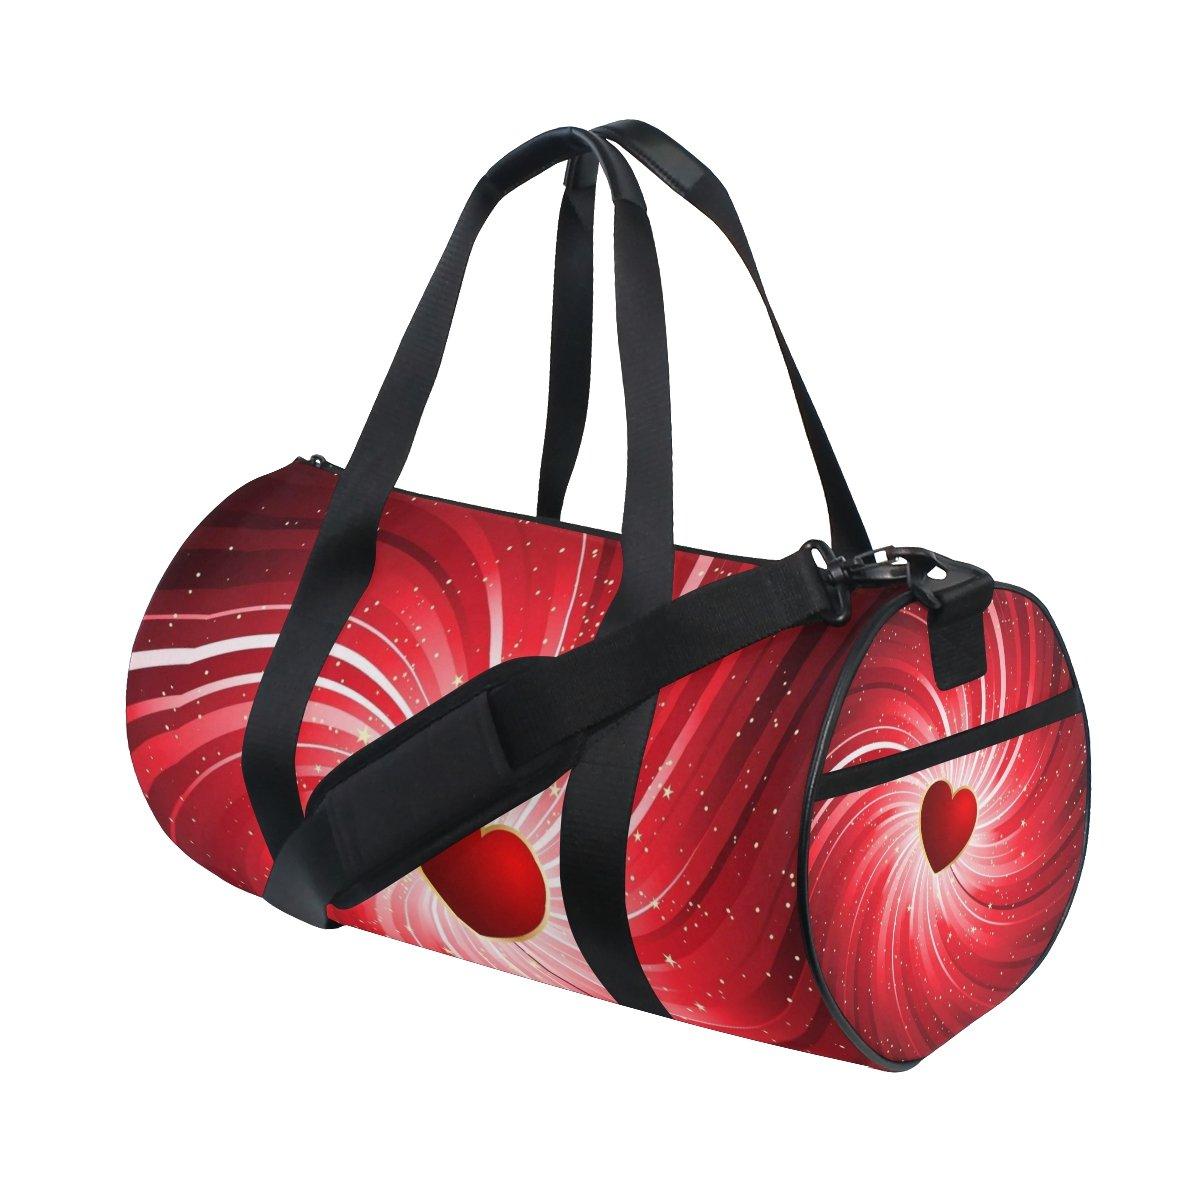 U LIFE Valentines Day Heart Stars Love You Summer Spring Wedding Sports Gym Shoulder Handy Duffel Bags for Women Men Kids Boys Girls